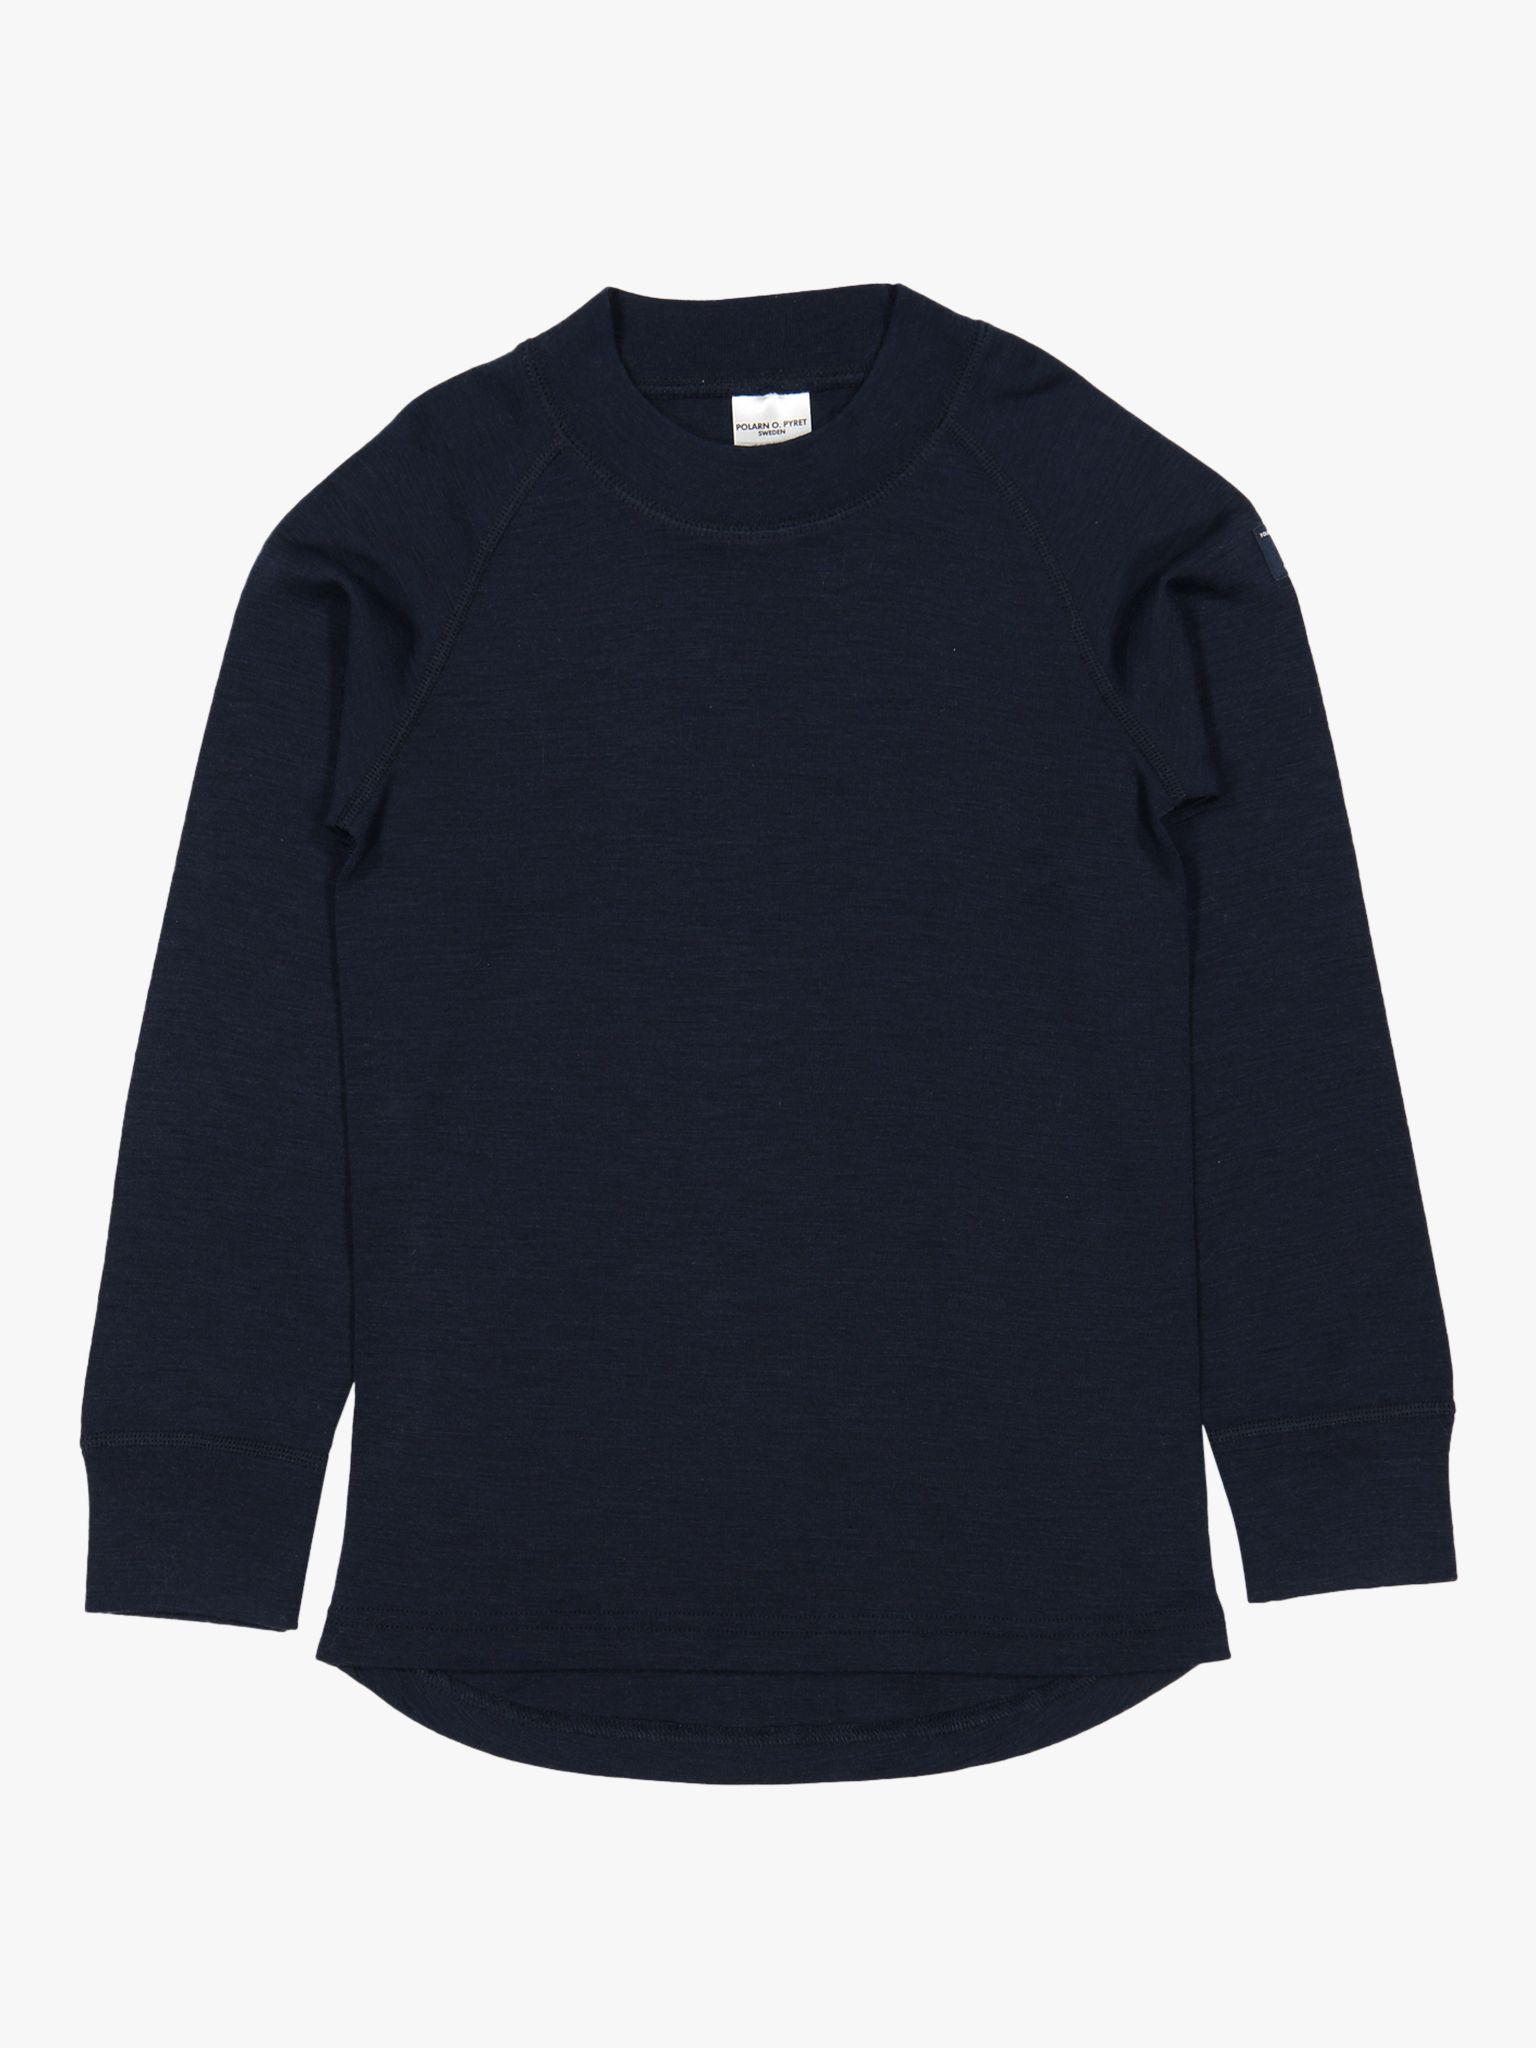 Polarn O. Pyret Polarn O. Pyret Children's Merino Wool Long Sleeve Top, Dark Sapphire